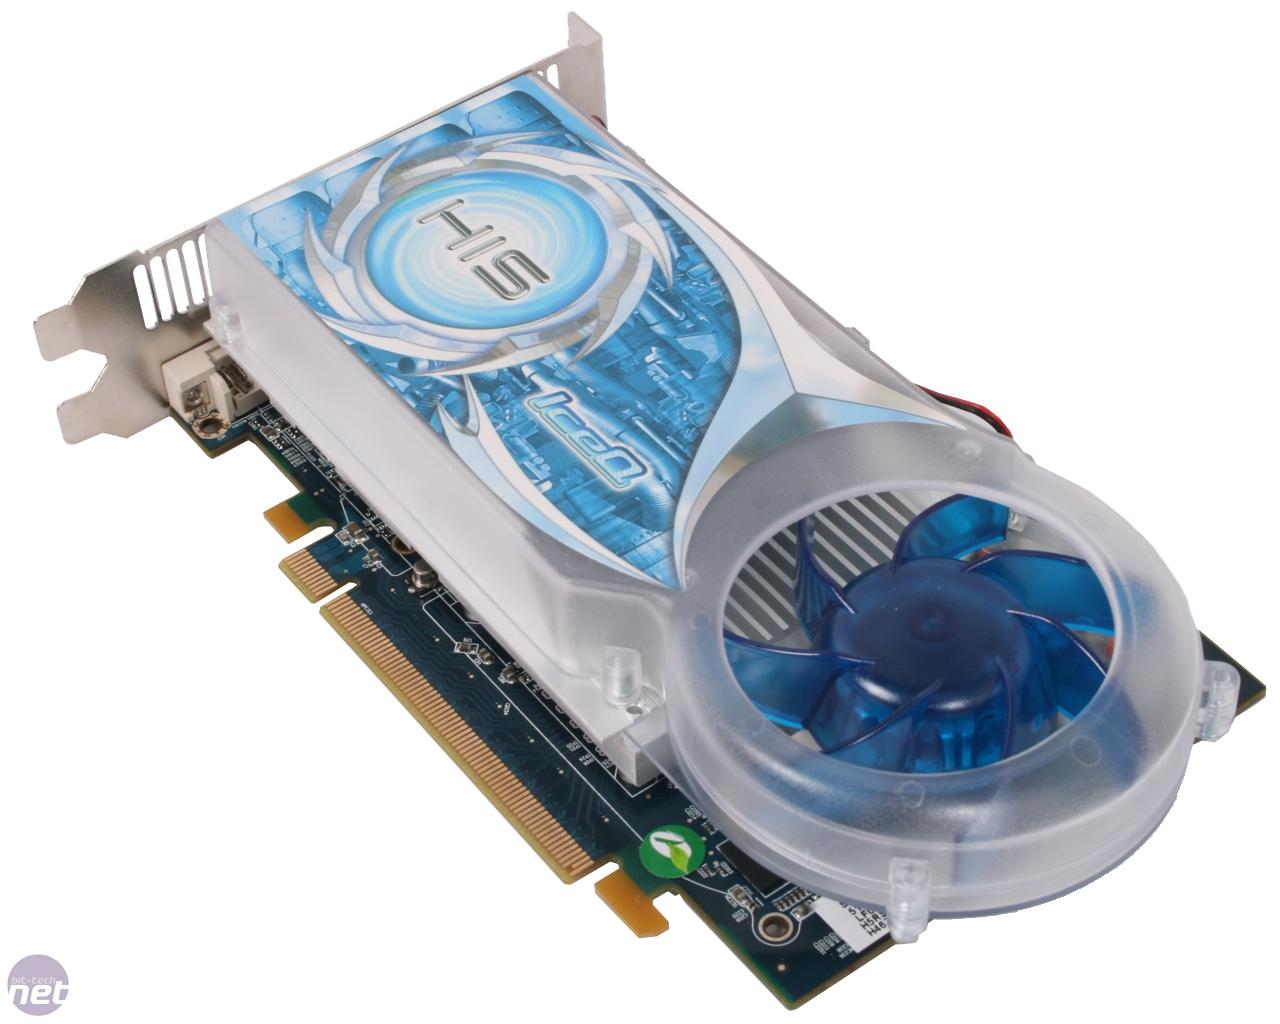 His Ati Radeon Hd 4670 Iceq Driver Download